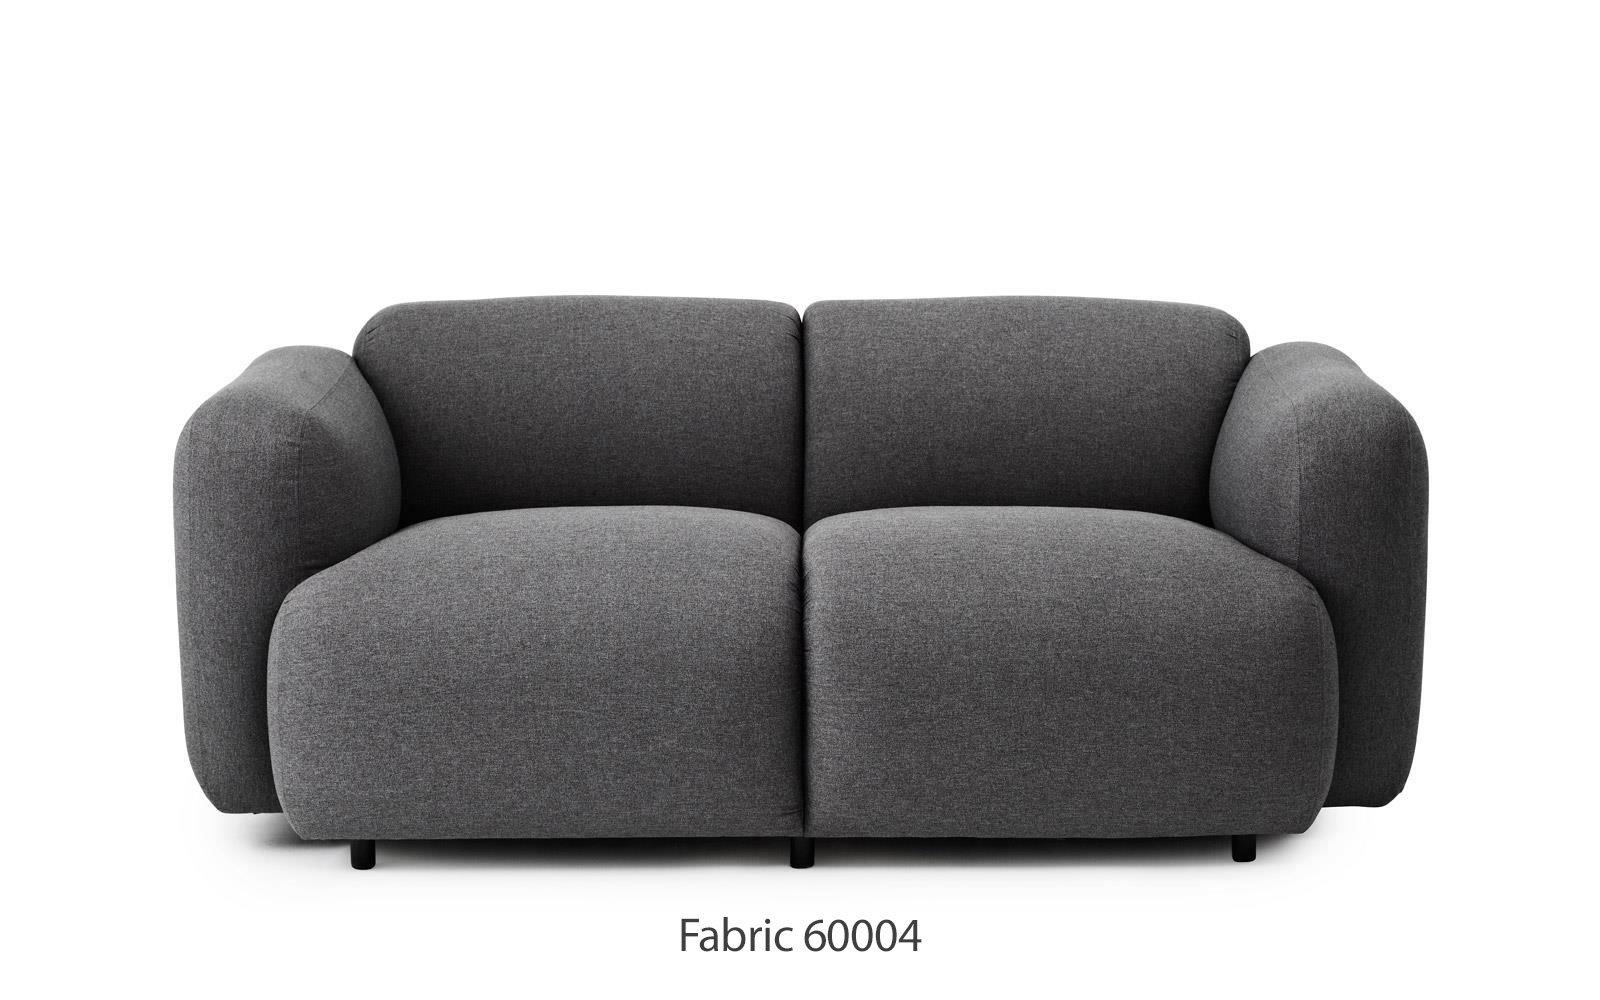 Swell 2 seater Sofa by Normann Copenhagen